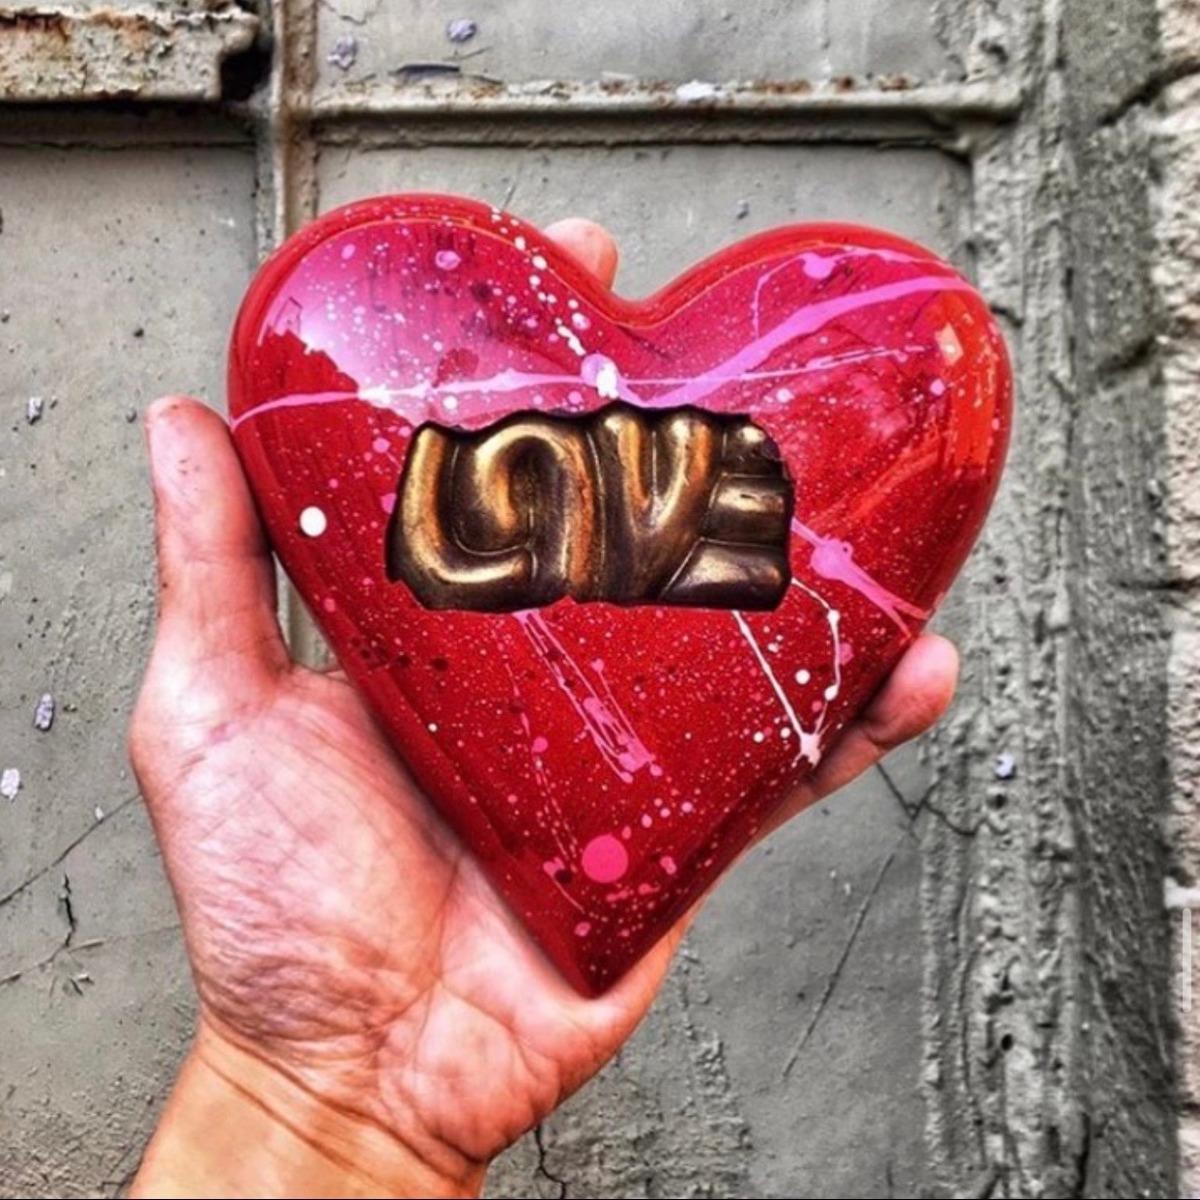 David Chow Chocolate Heart